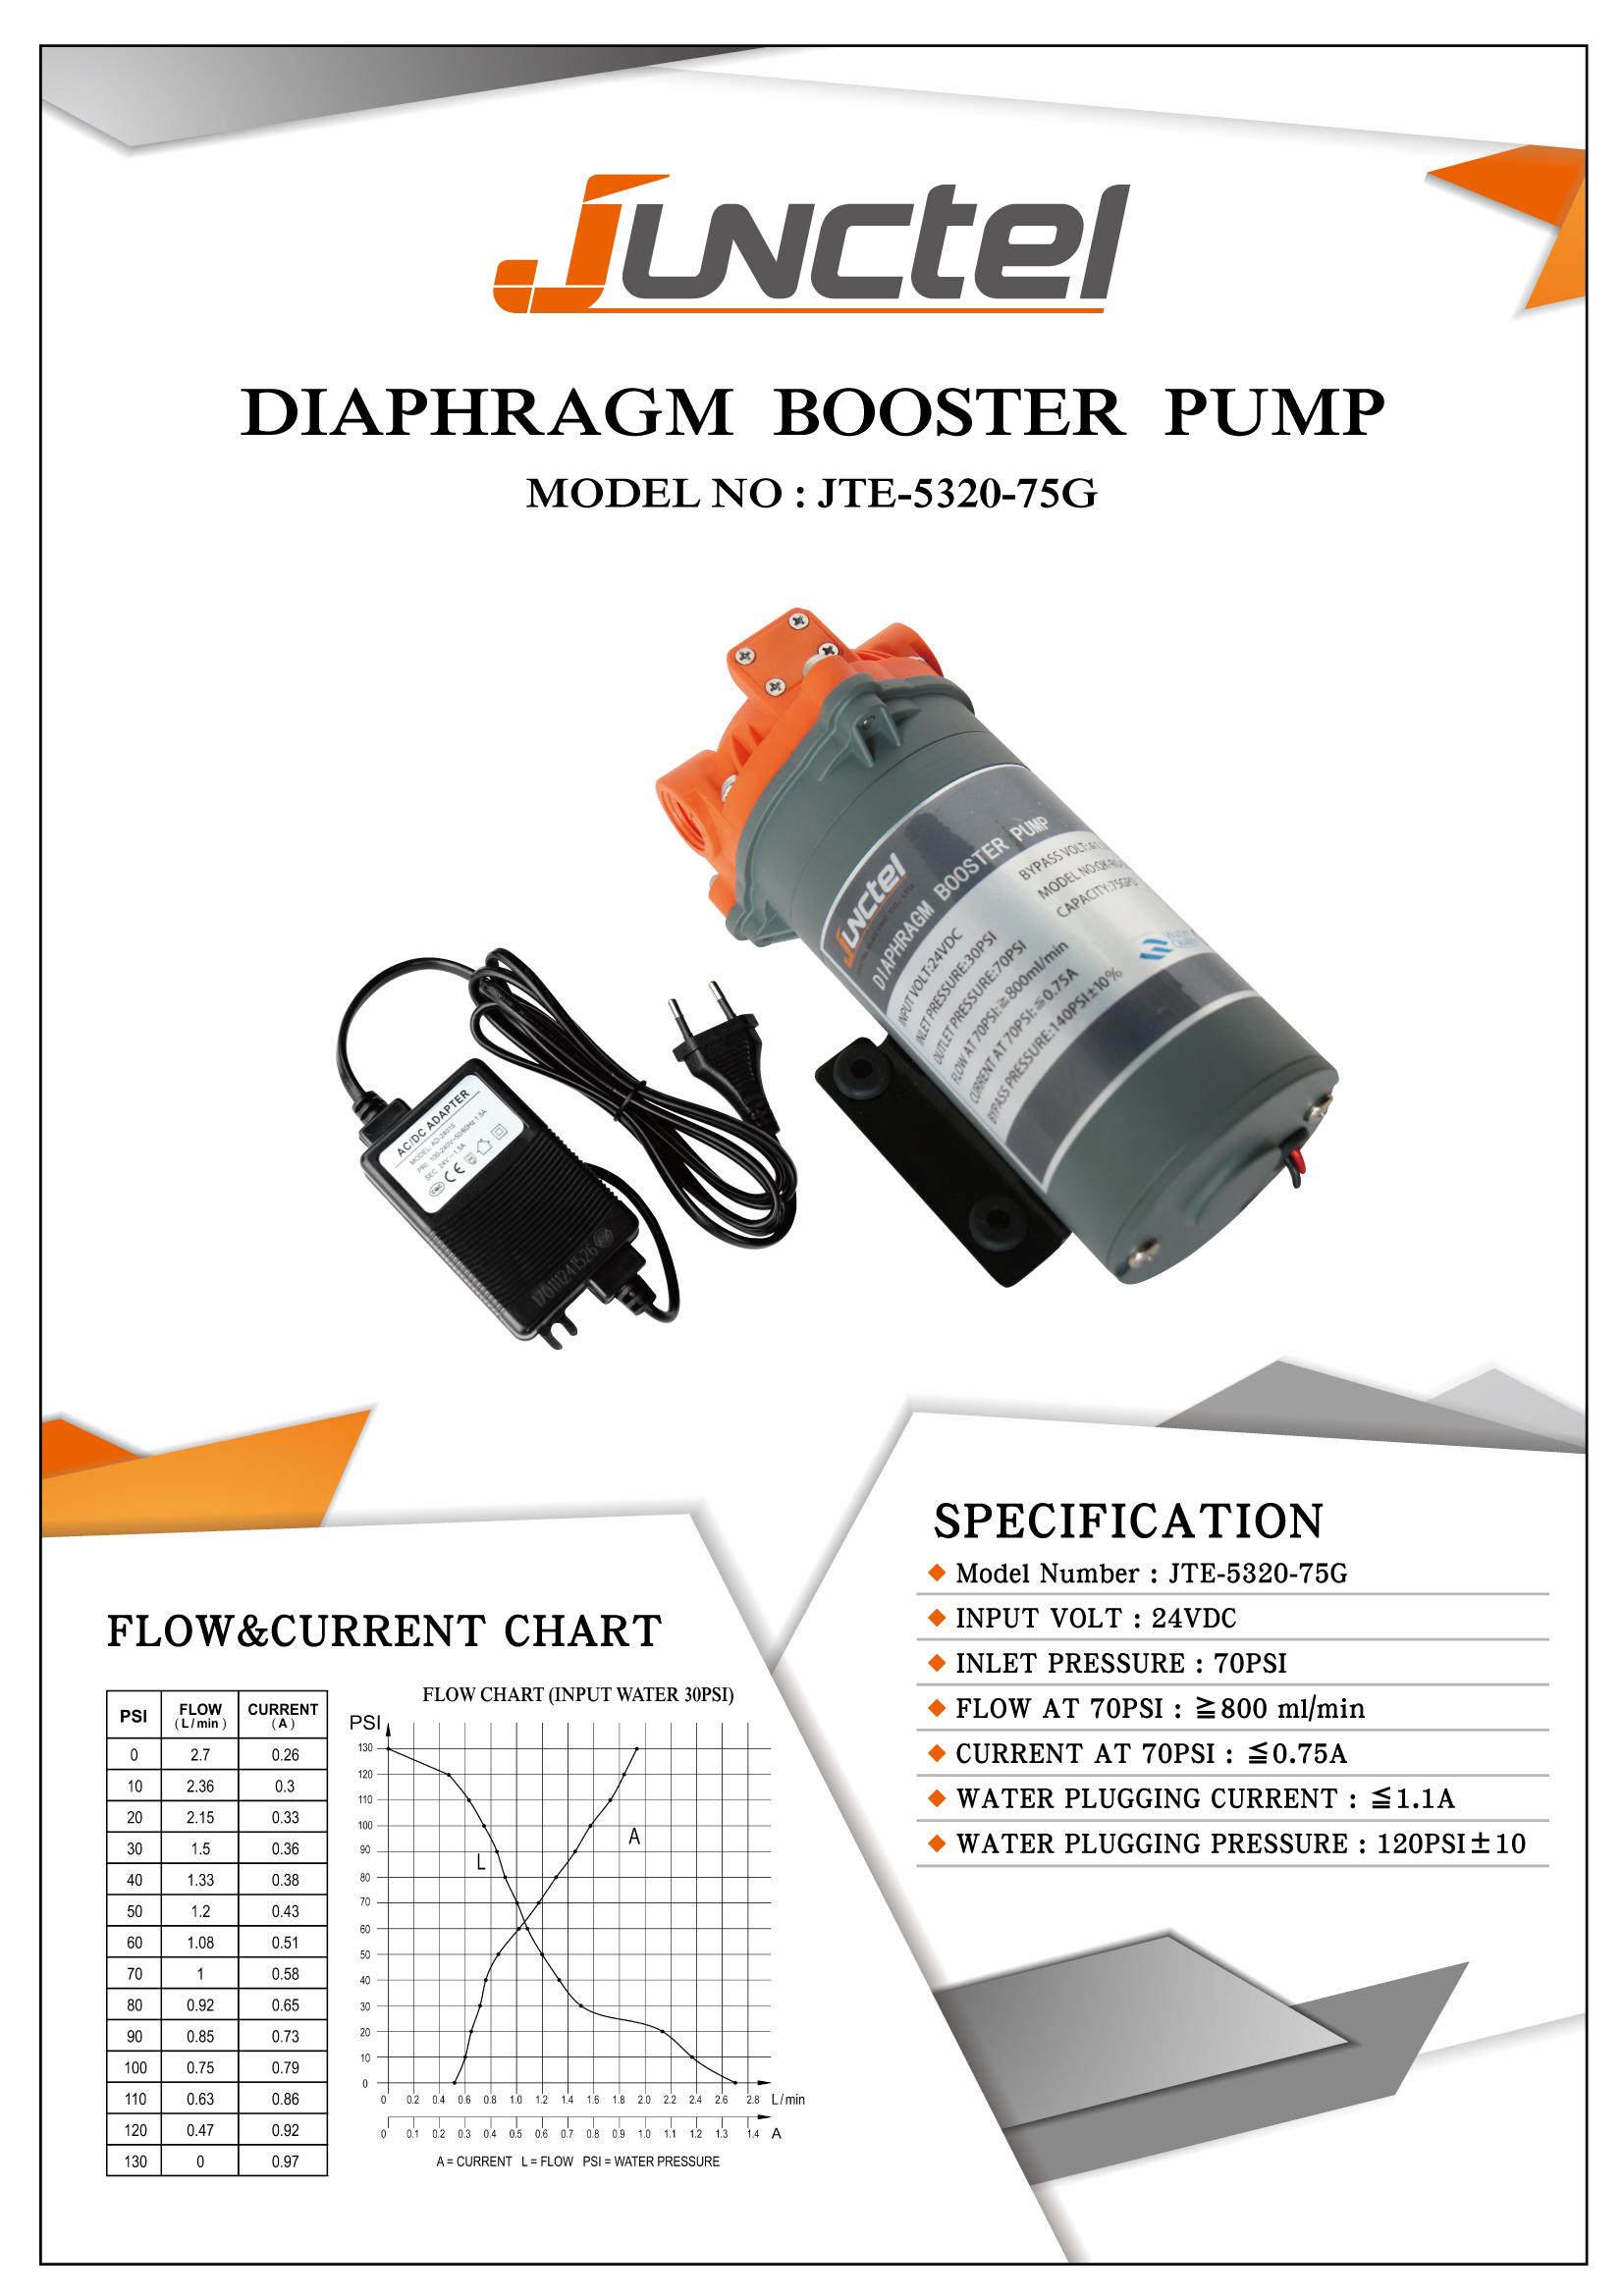 Taiwan Diaphragm Booster Pump 75gpd Aqua Care Co Ltd